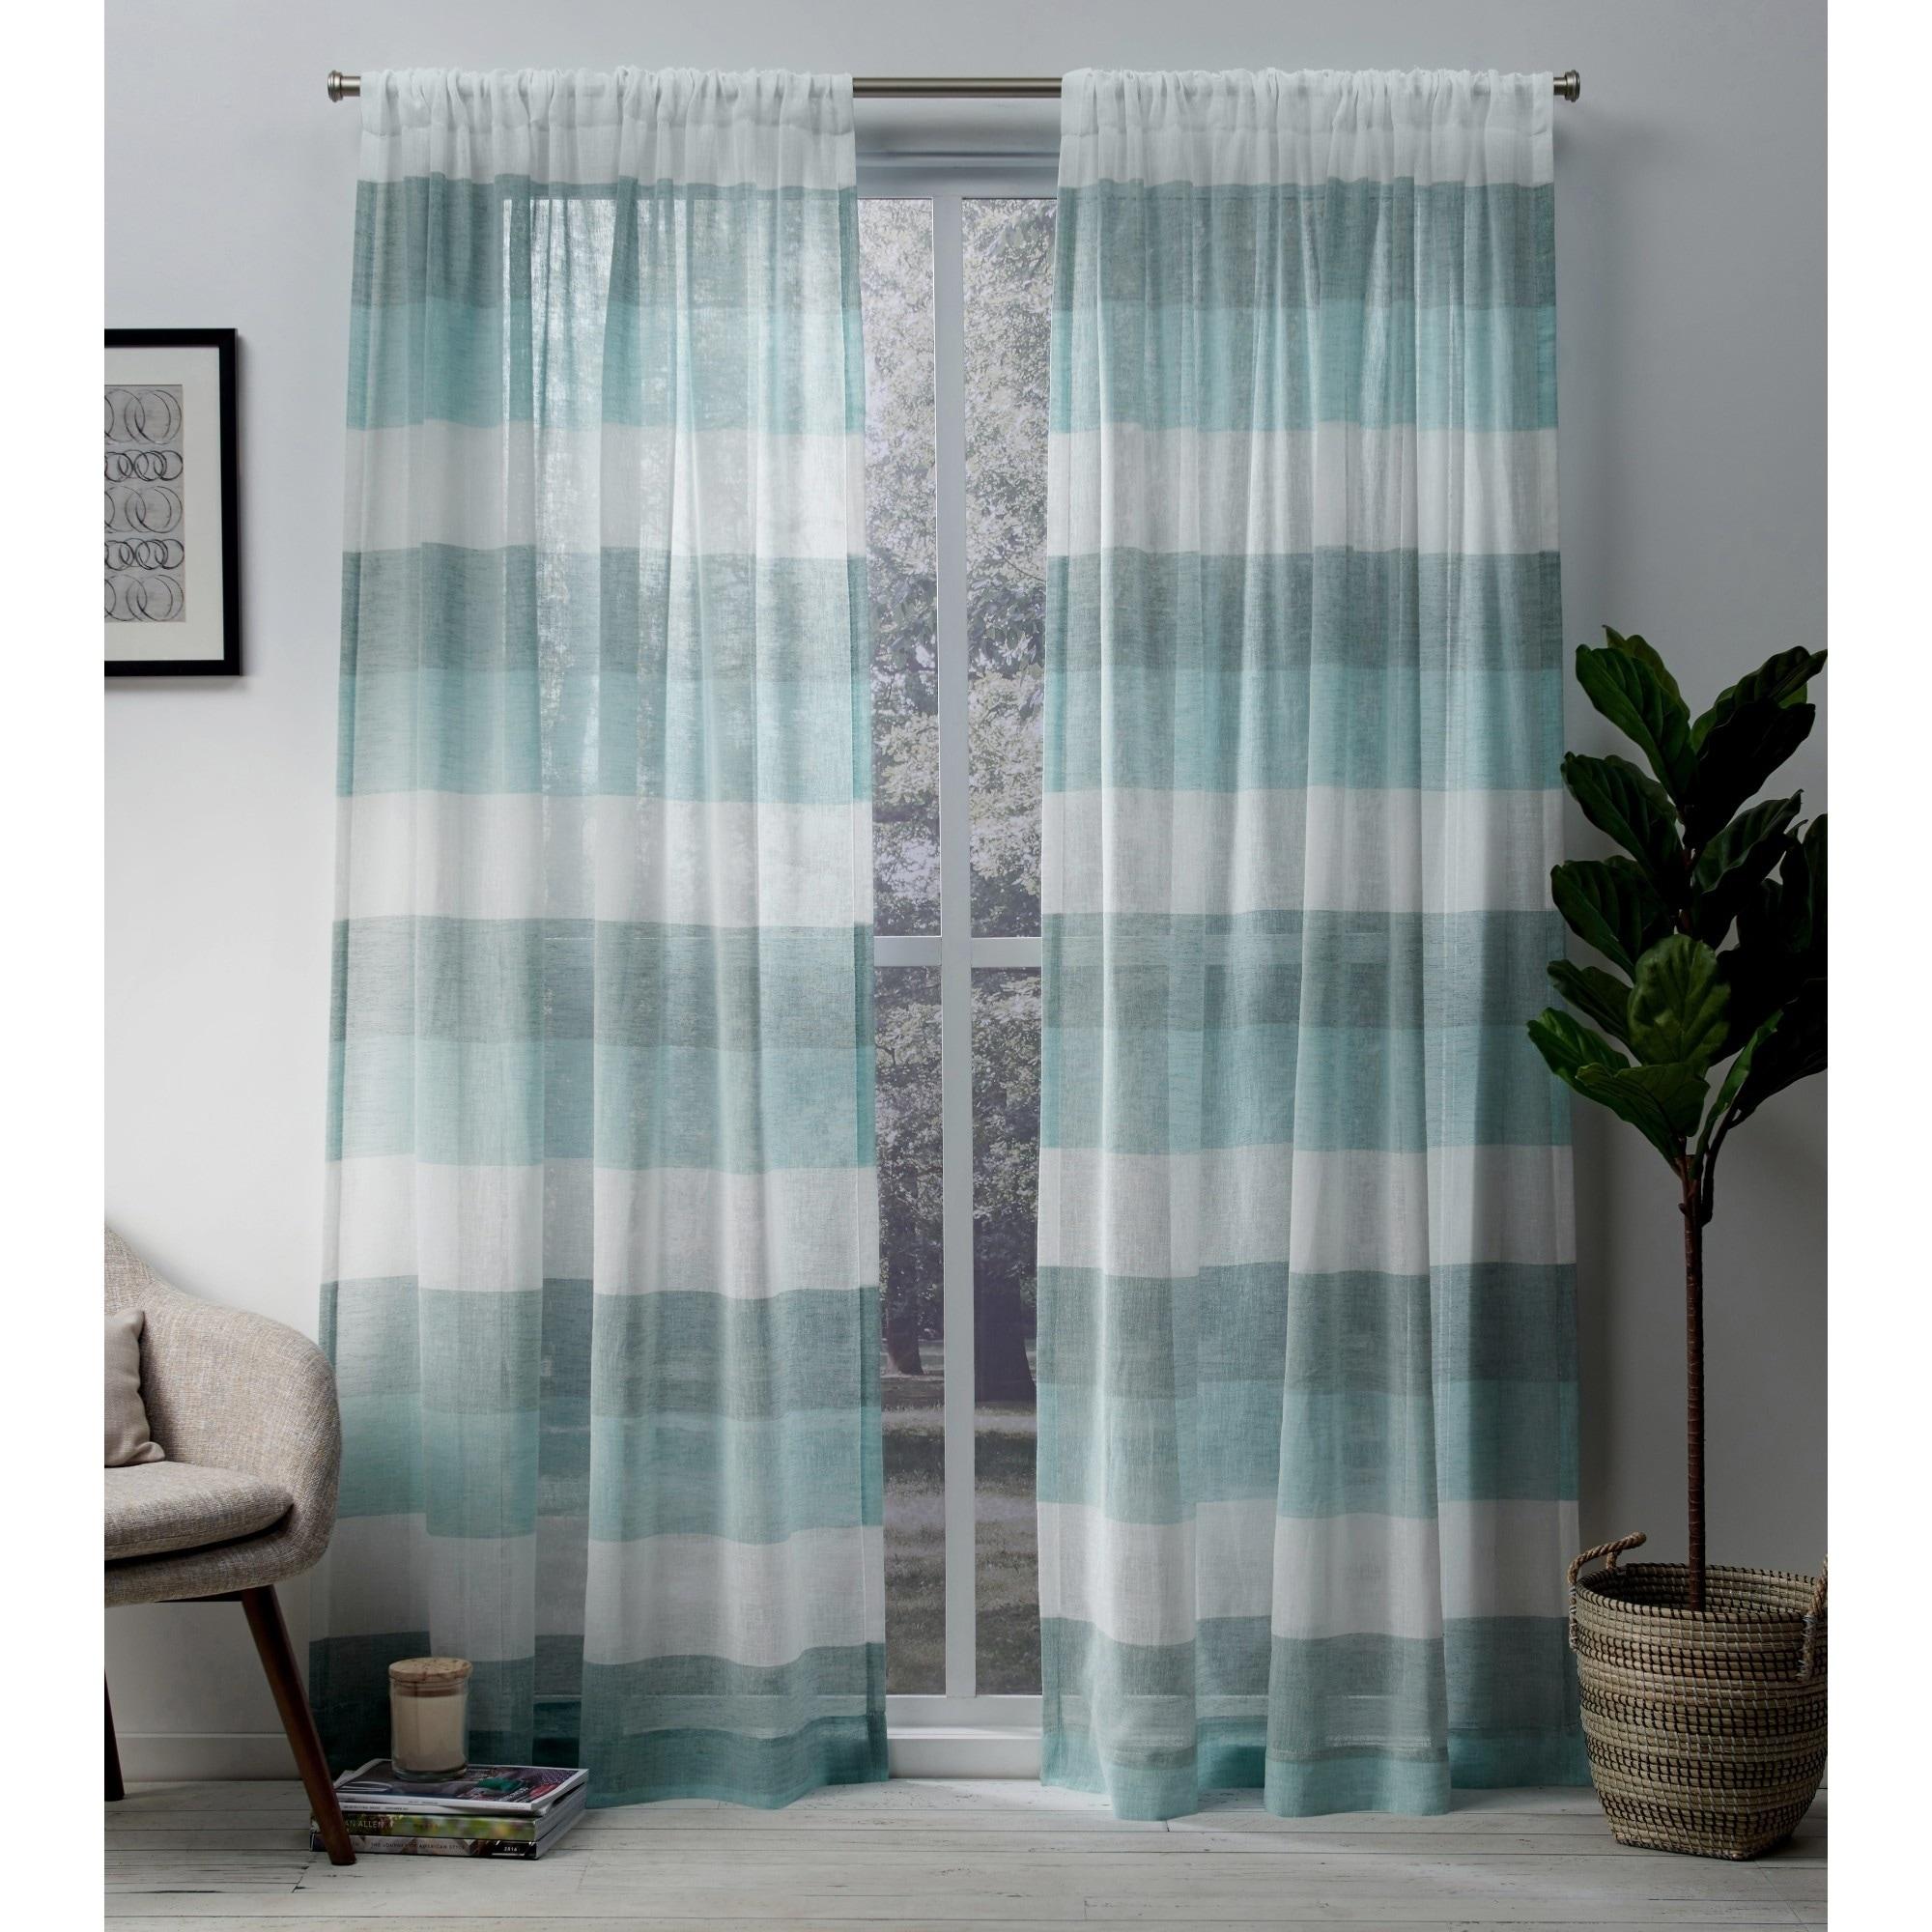 Porch Den Ocean Stripe Sheer Curtain Panel Pair With Rod Pocket